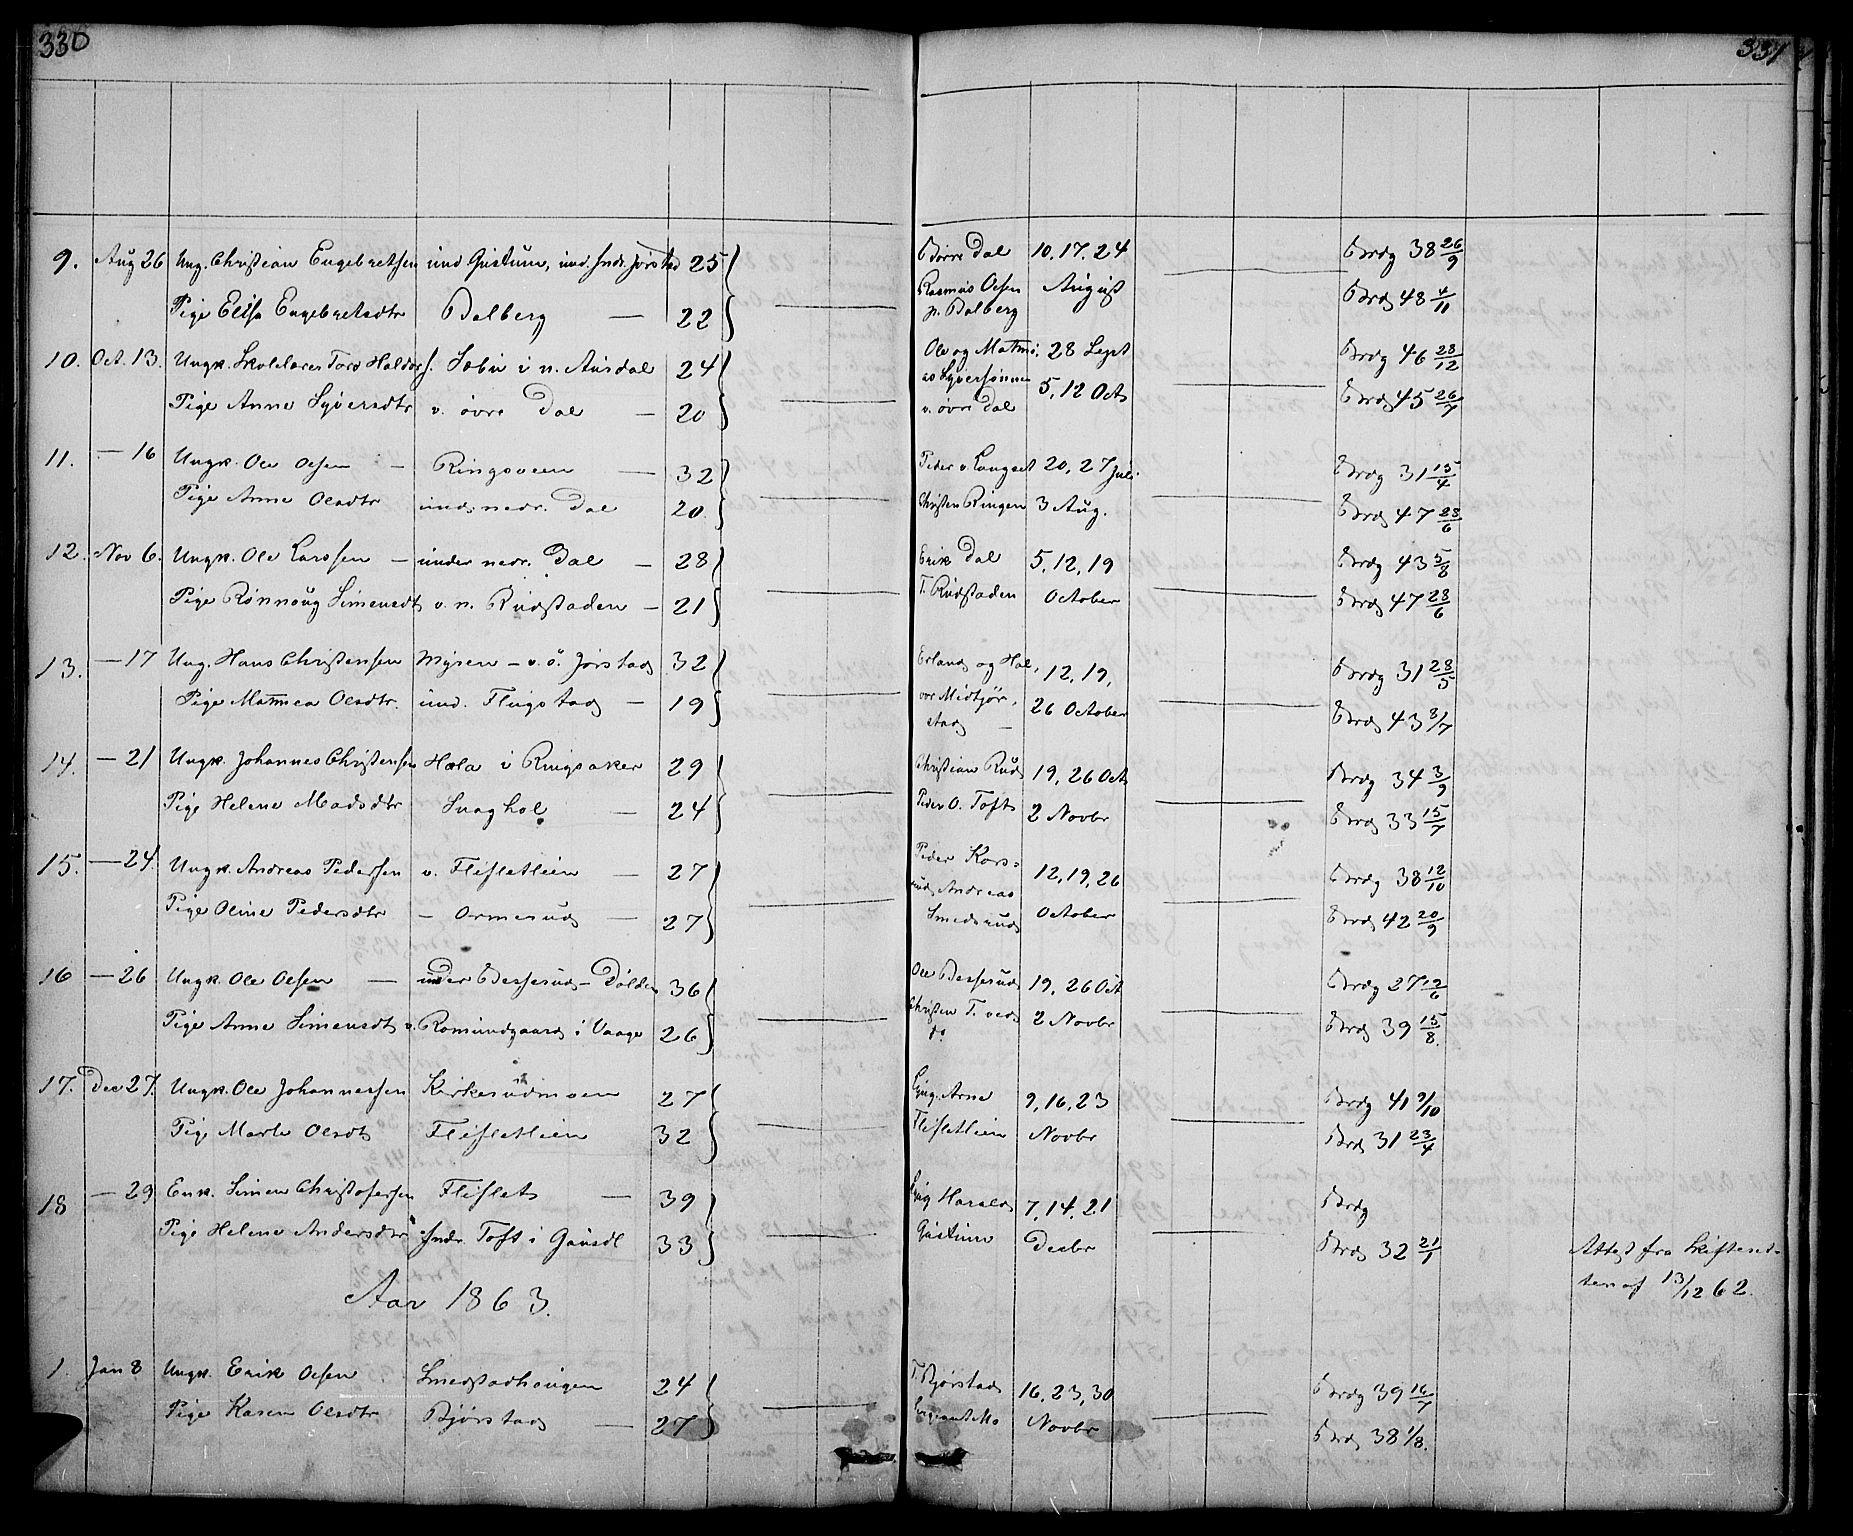 SAH, Fåberg prestekontor, Klokkerbok nr. 5, 1837-1864, s. 328-329